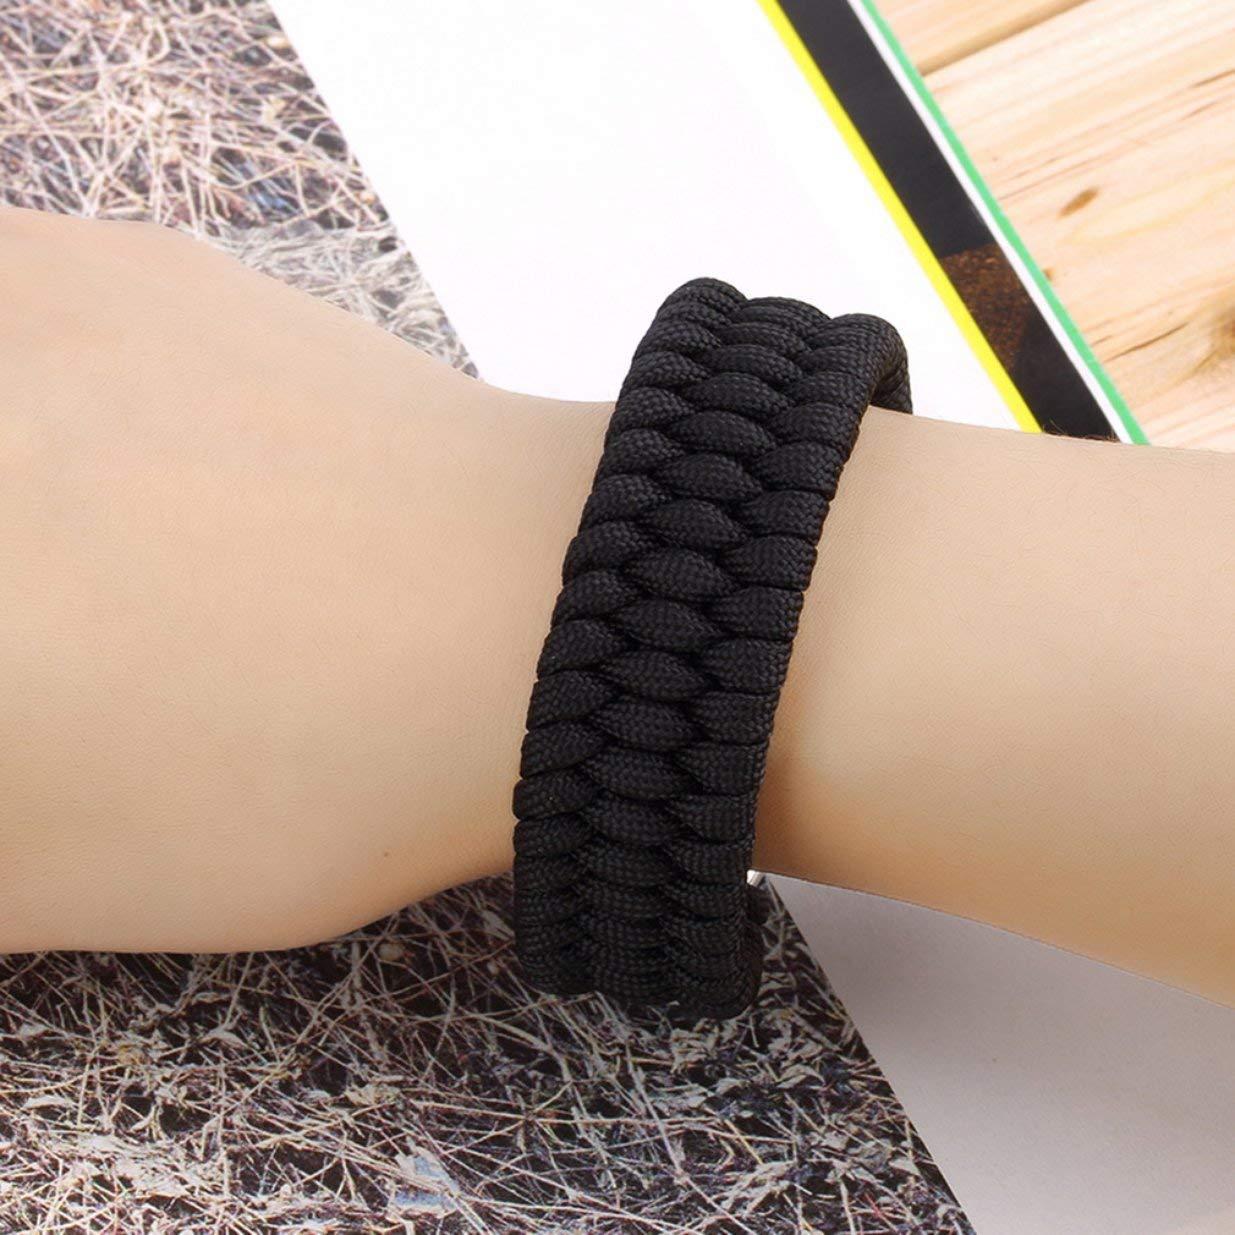 Sairis Outdoor Camping Survival Armband Weave Handmade 7-Stand Edelstahl Sch/äkel Schnalle Self-Rescue Survival Tools Kits